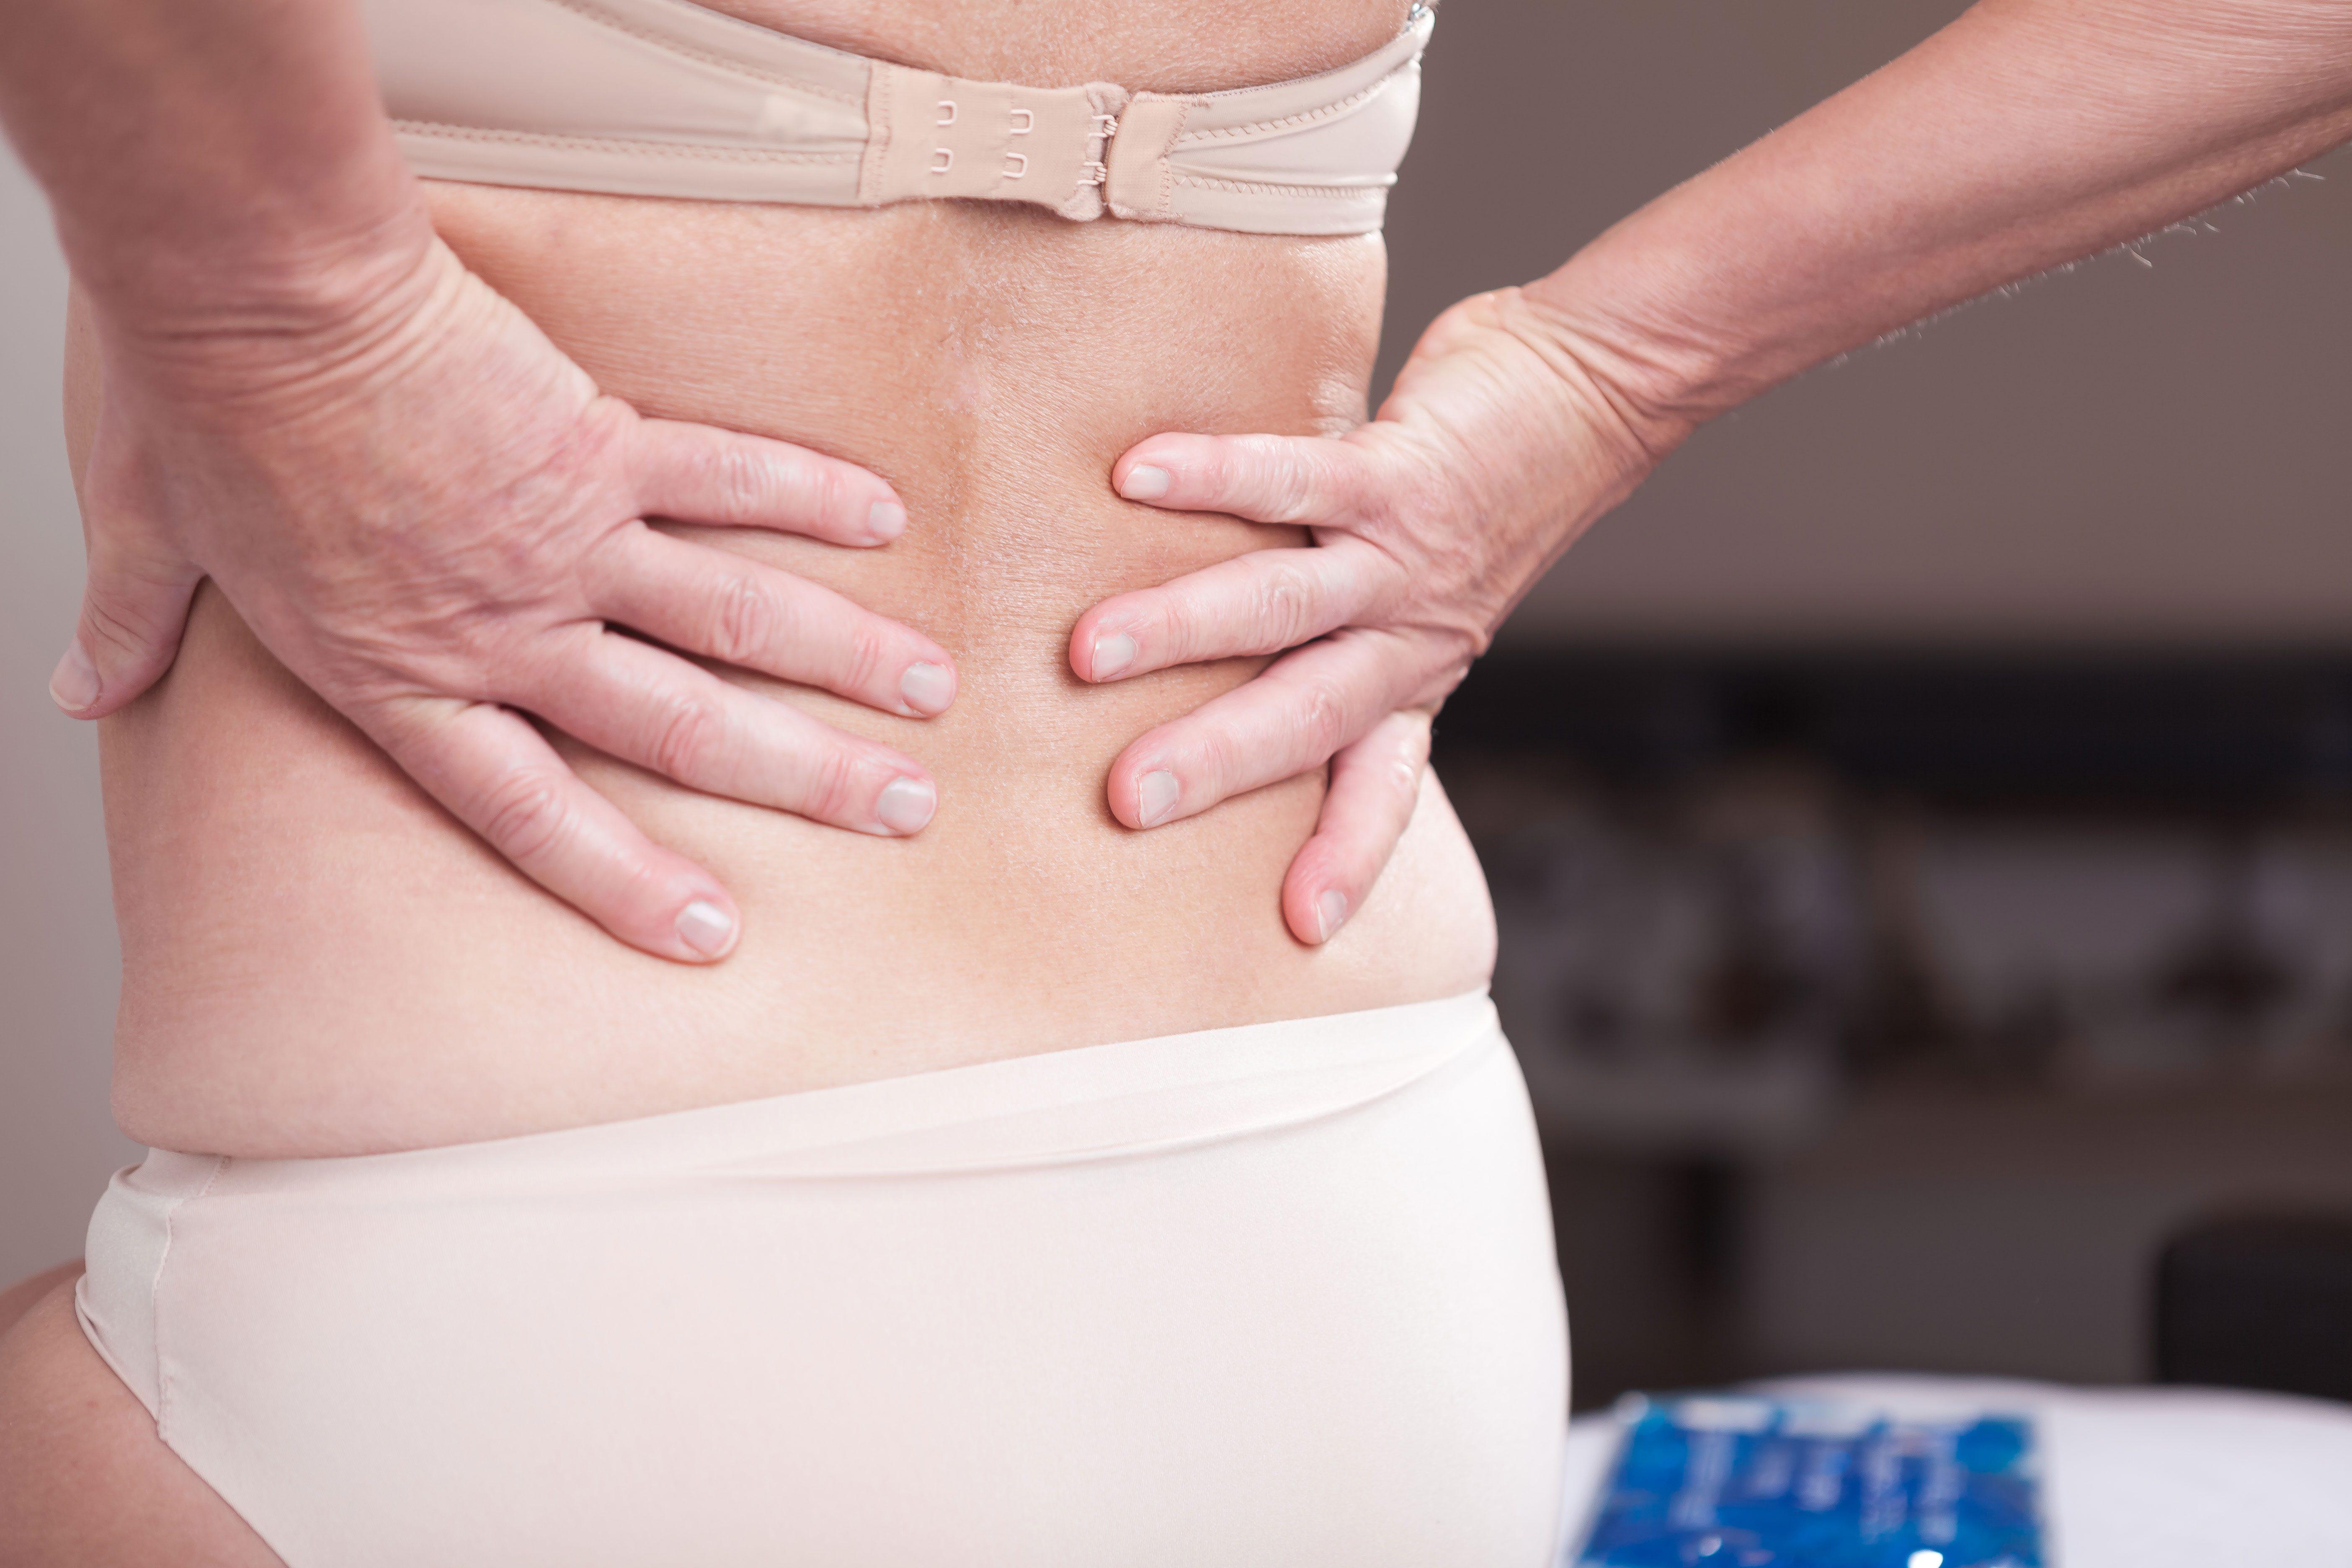 iskiasnerve i klemme massage